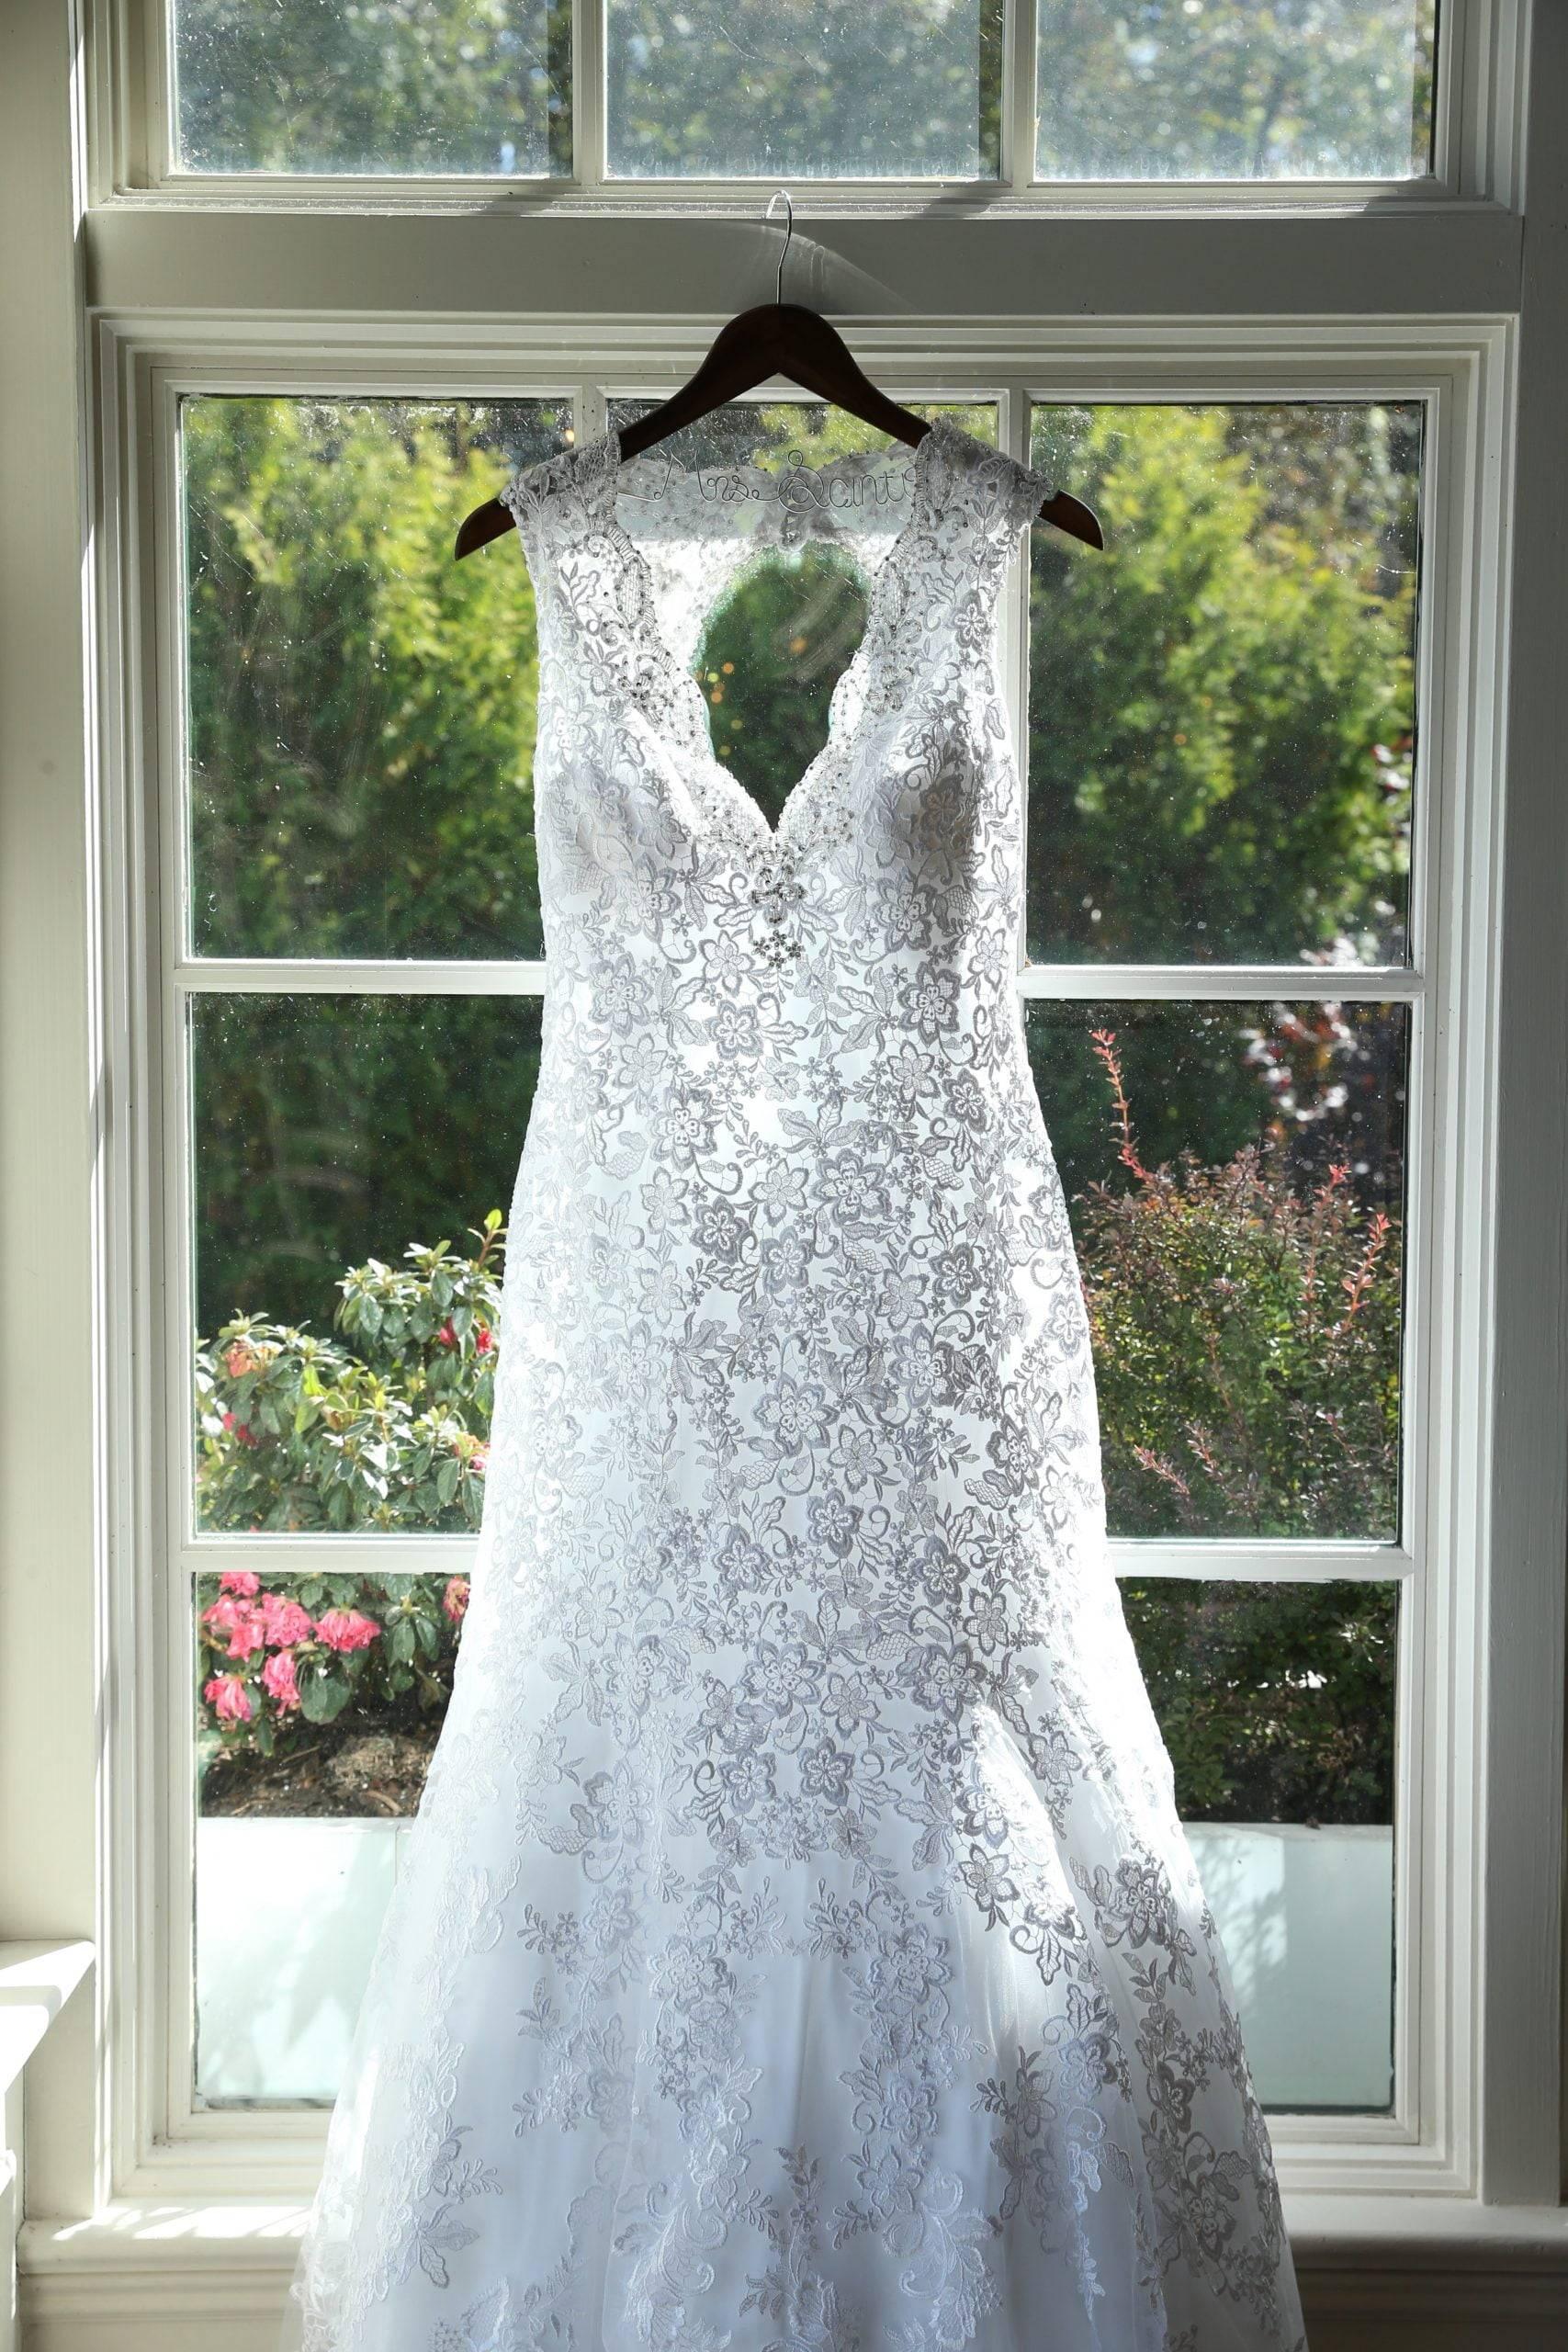 Park Savoy wedding gown hanging up